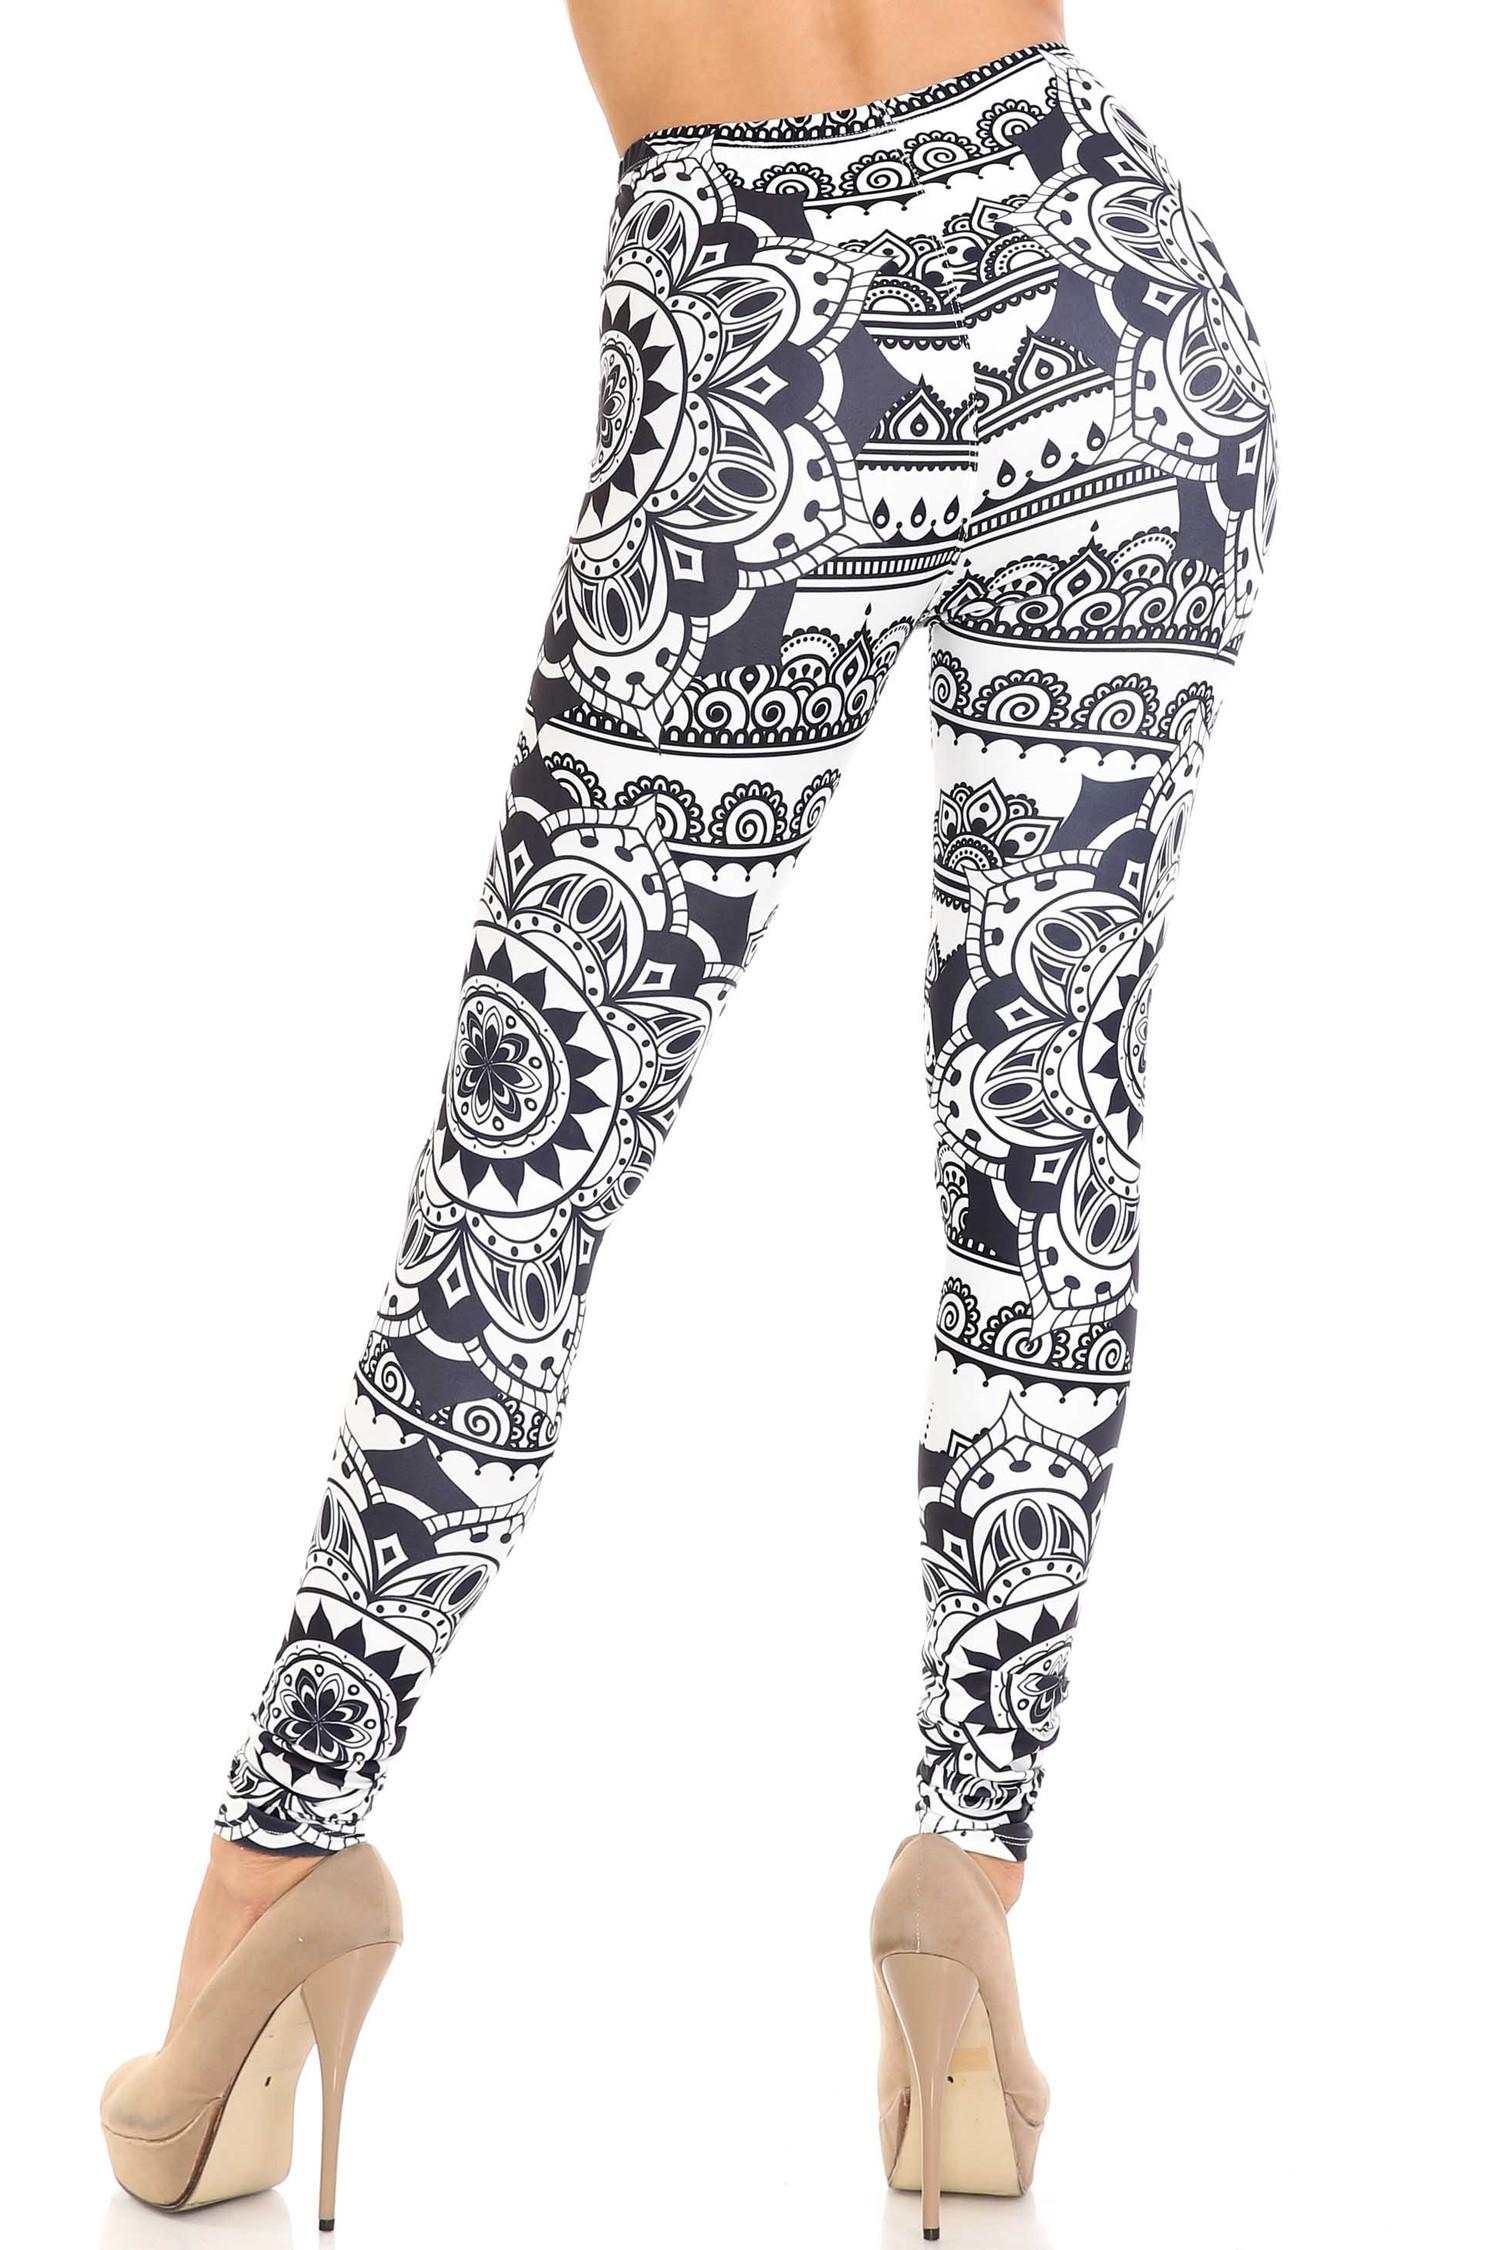 Creamy Soft Monochrome Mandala Leggings - By USA Fashion™